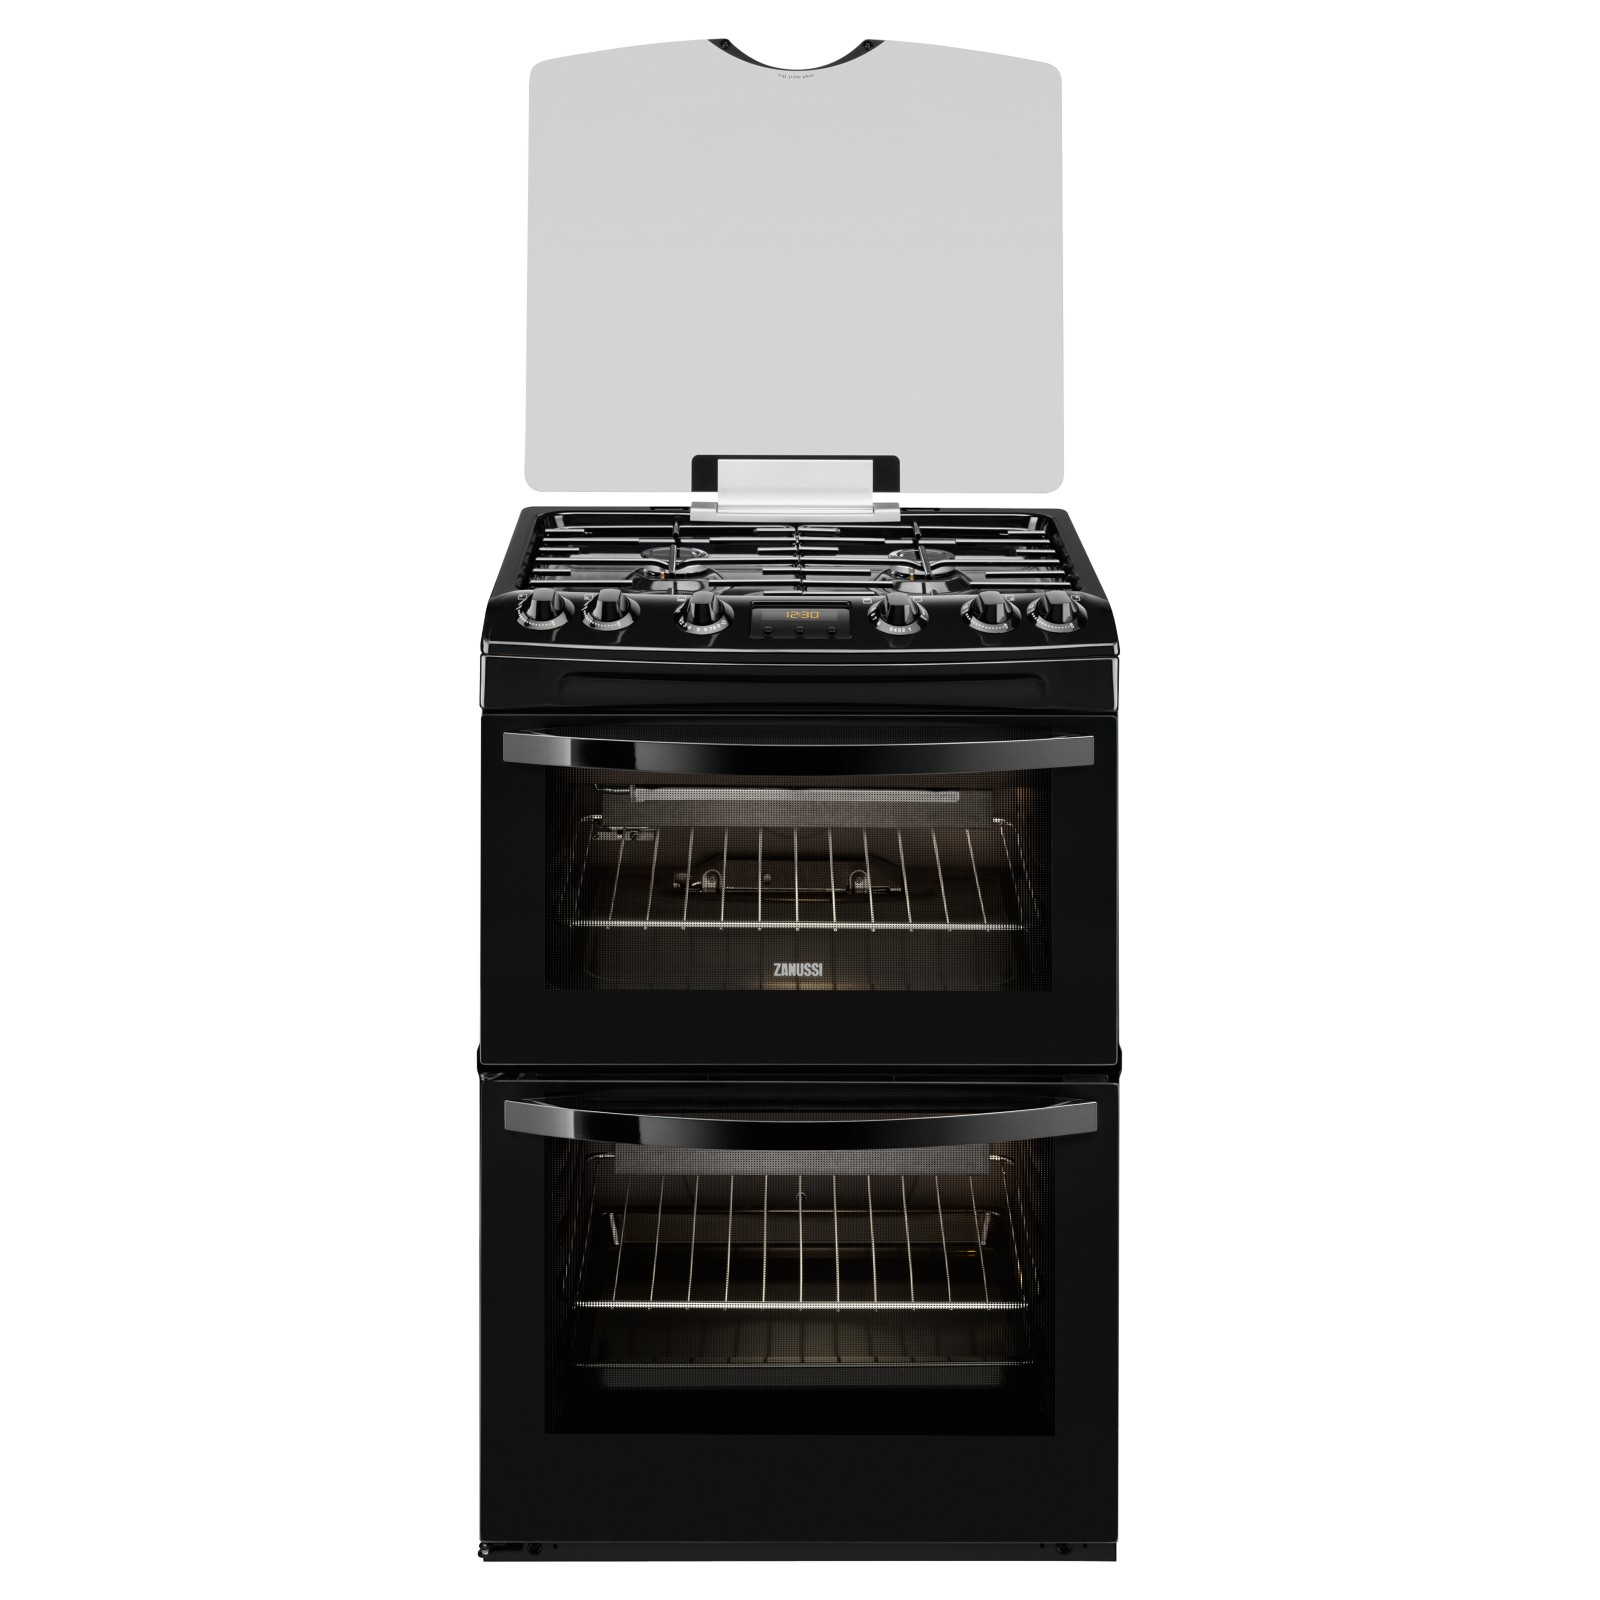 Zanussi ZCG63200BA Gas Cooker